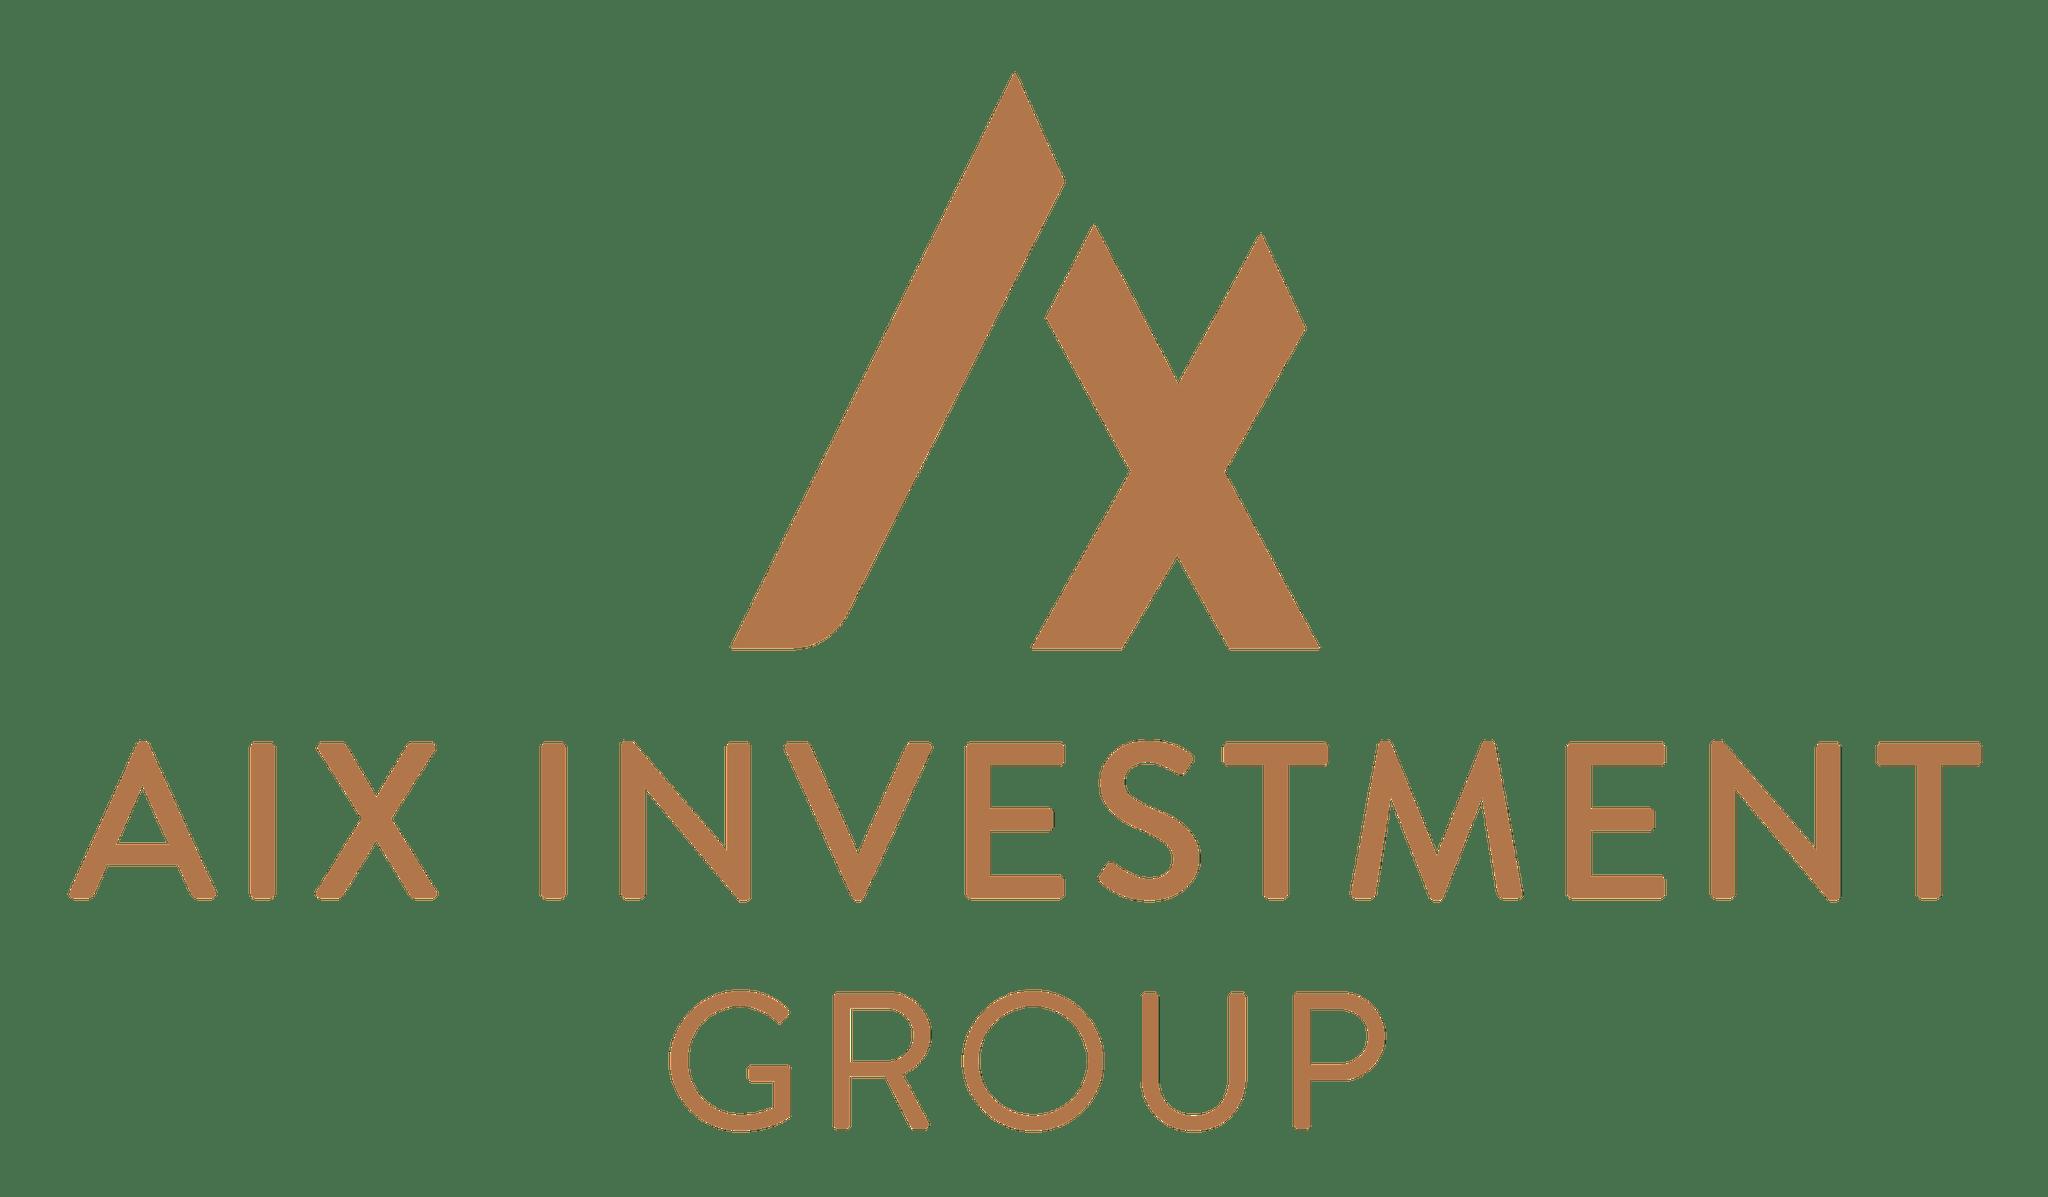 AIX Investment